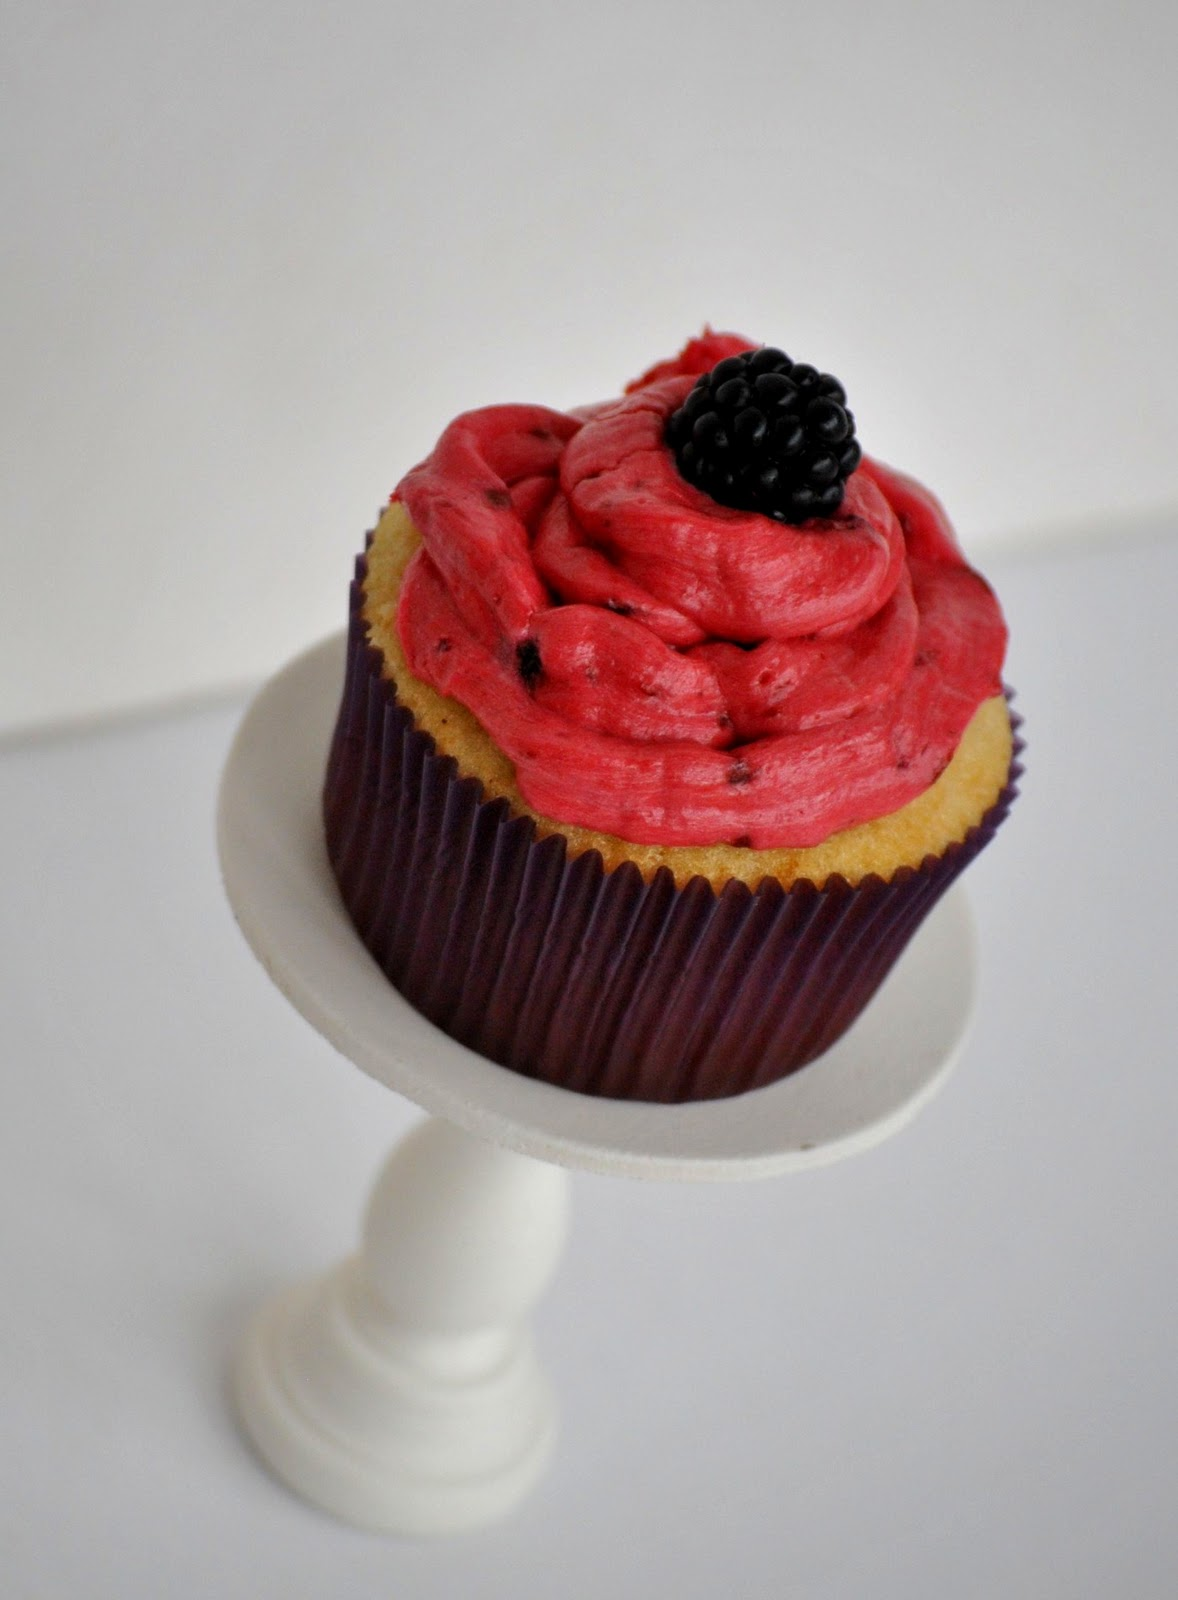 Blackberry Cupcakes Recipe